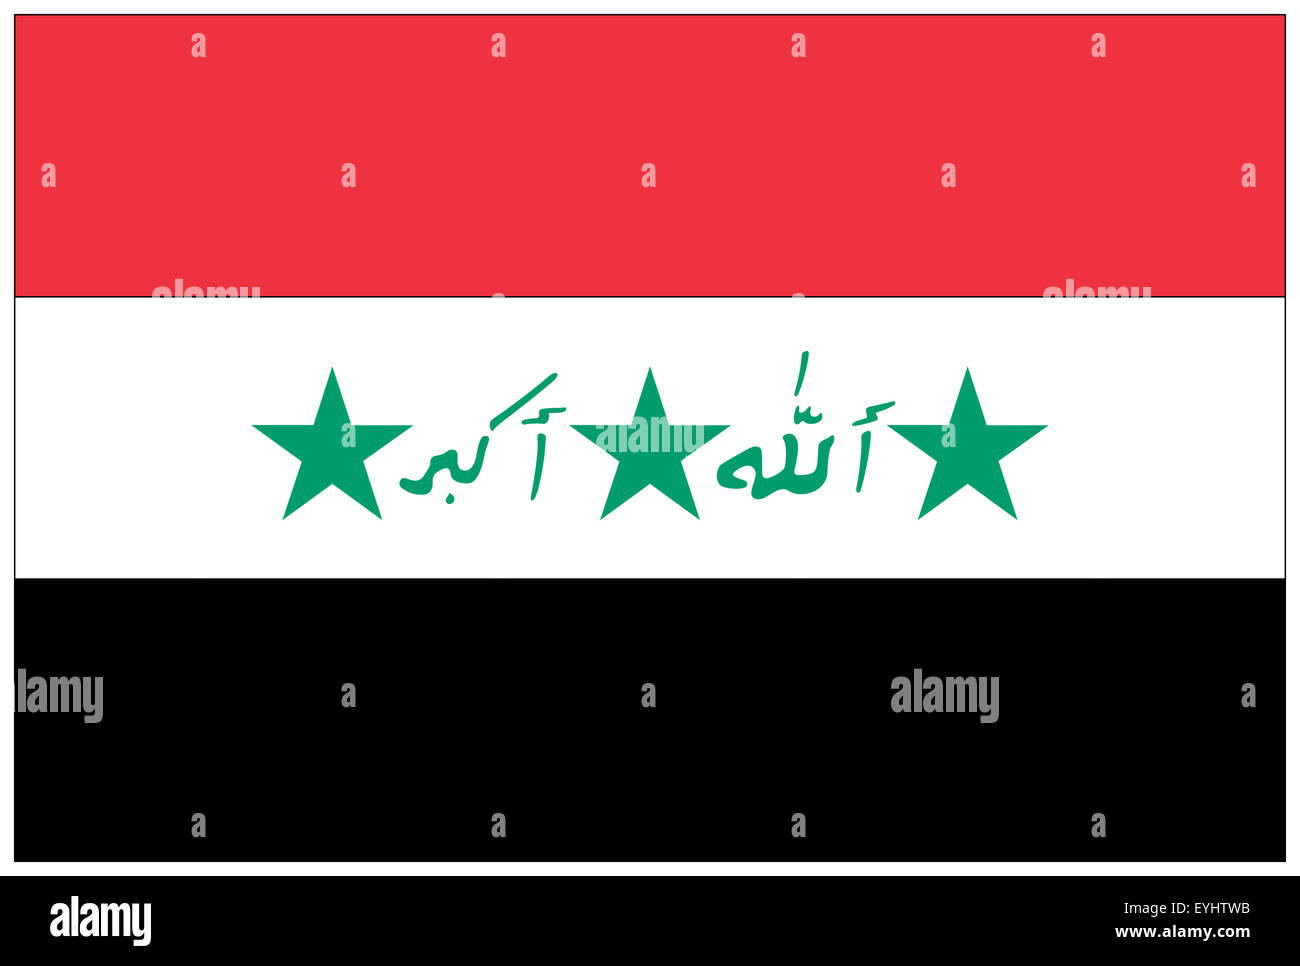 Fahne: Irak/ flag: Iraq. - Stock Image